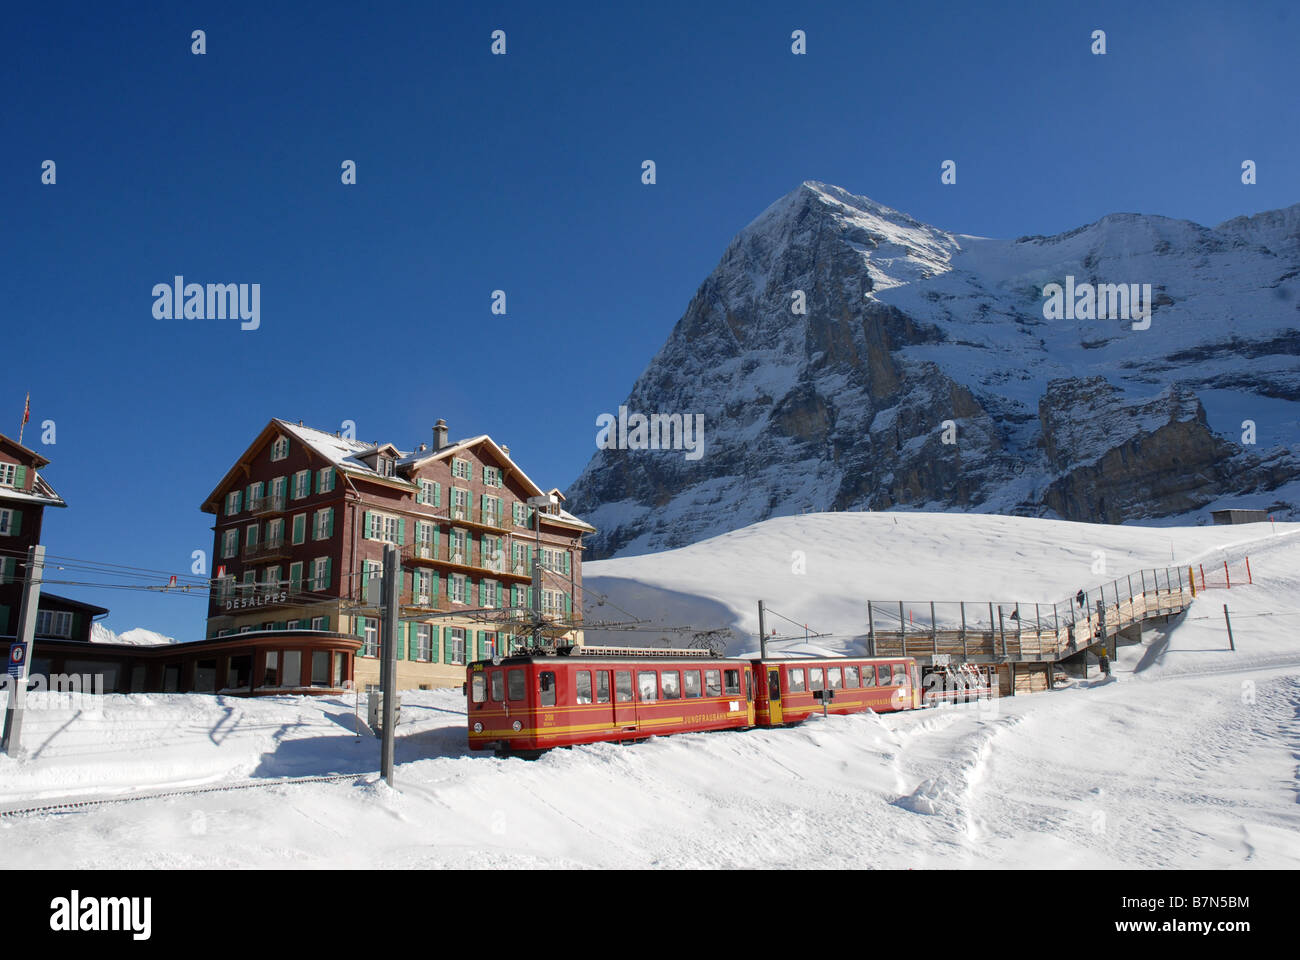 Train leaving kleine scheidegg going to jungfraujoch on the jungfrau mountain in switzerland - Stock Image